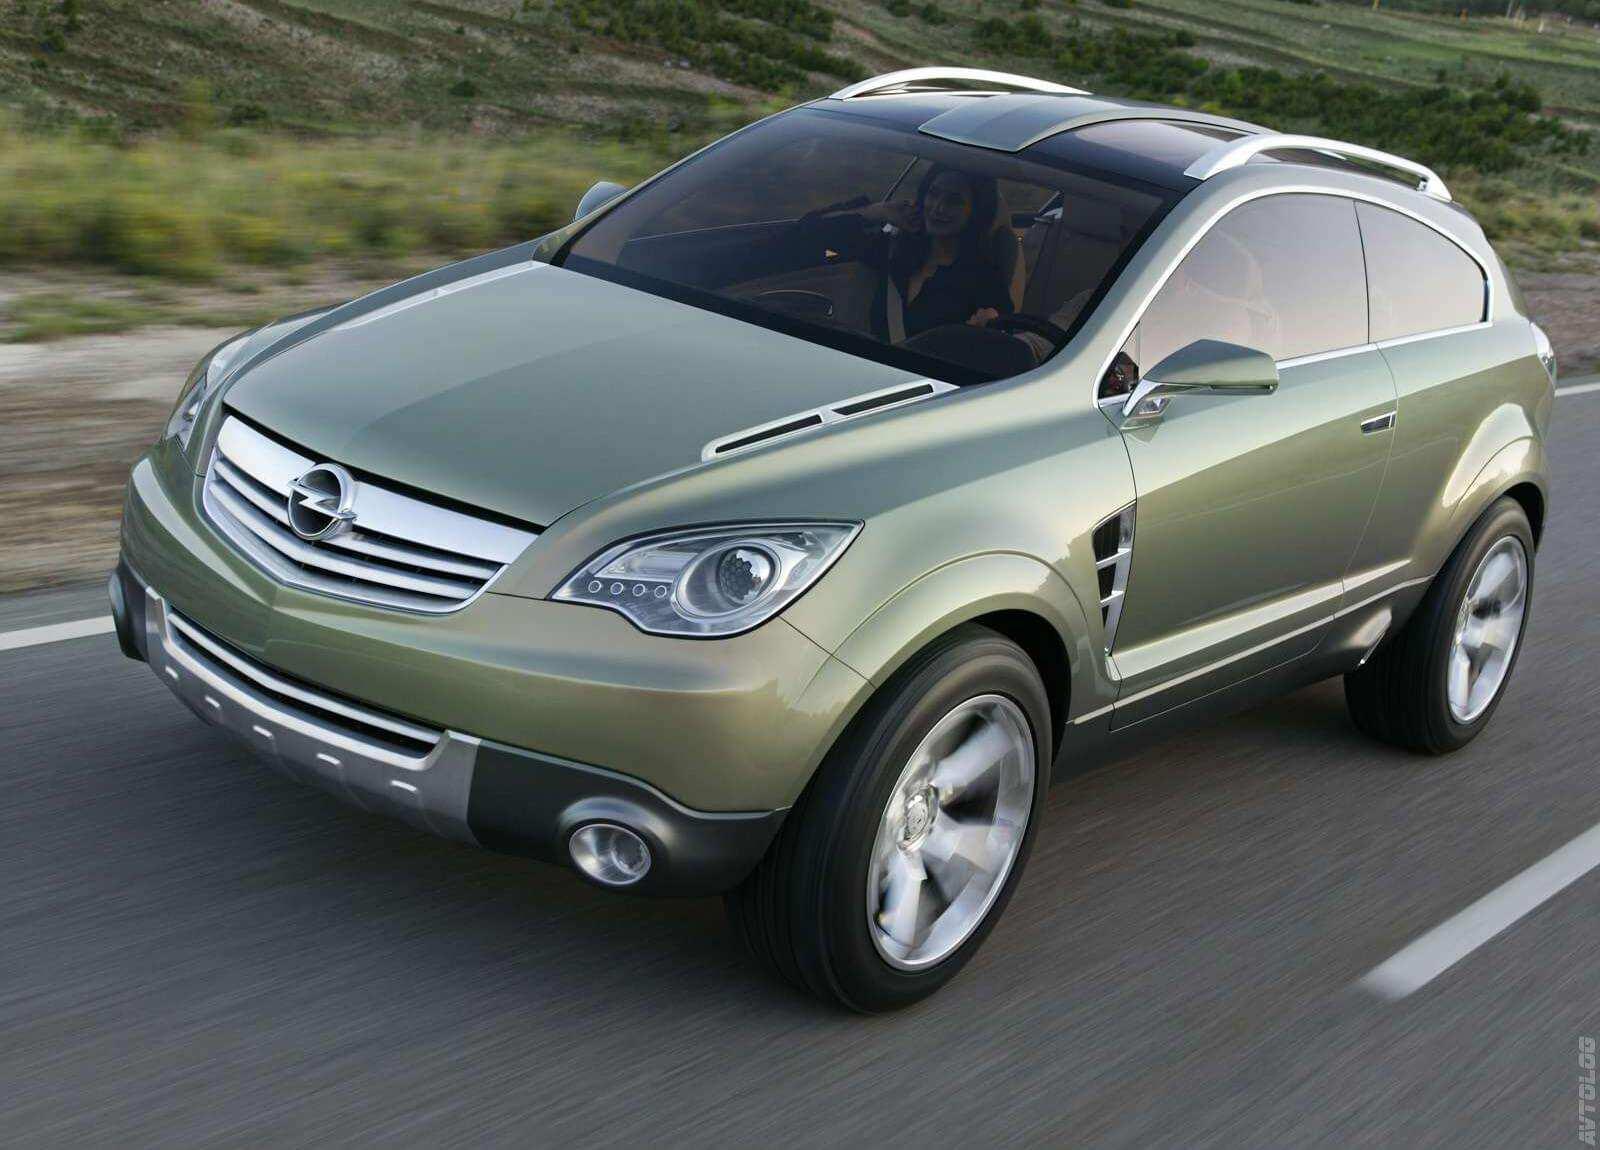 49 All New 2020 Opel Antara 2020 Spesification for 2020 Opel Antara 2020